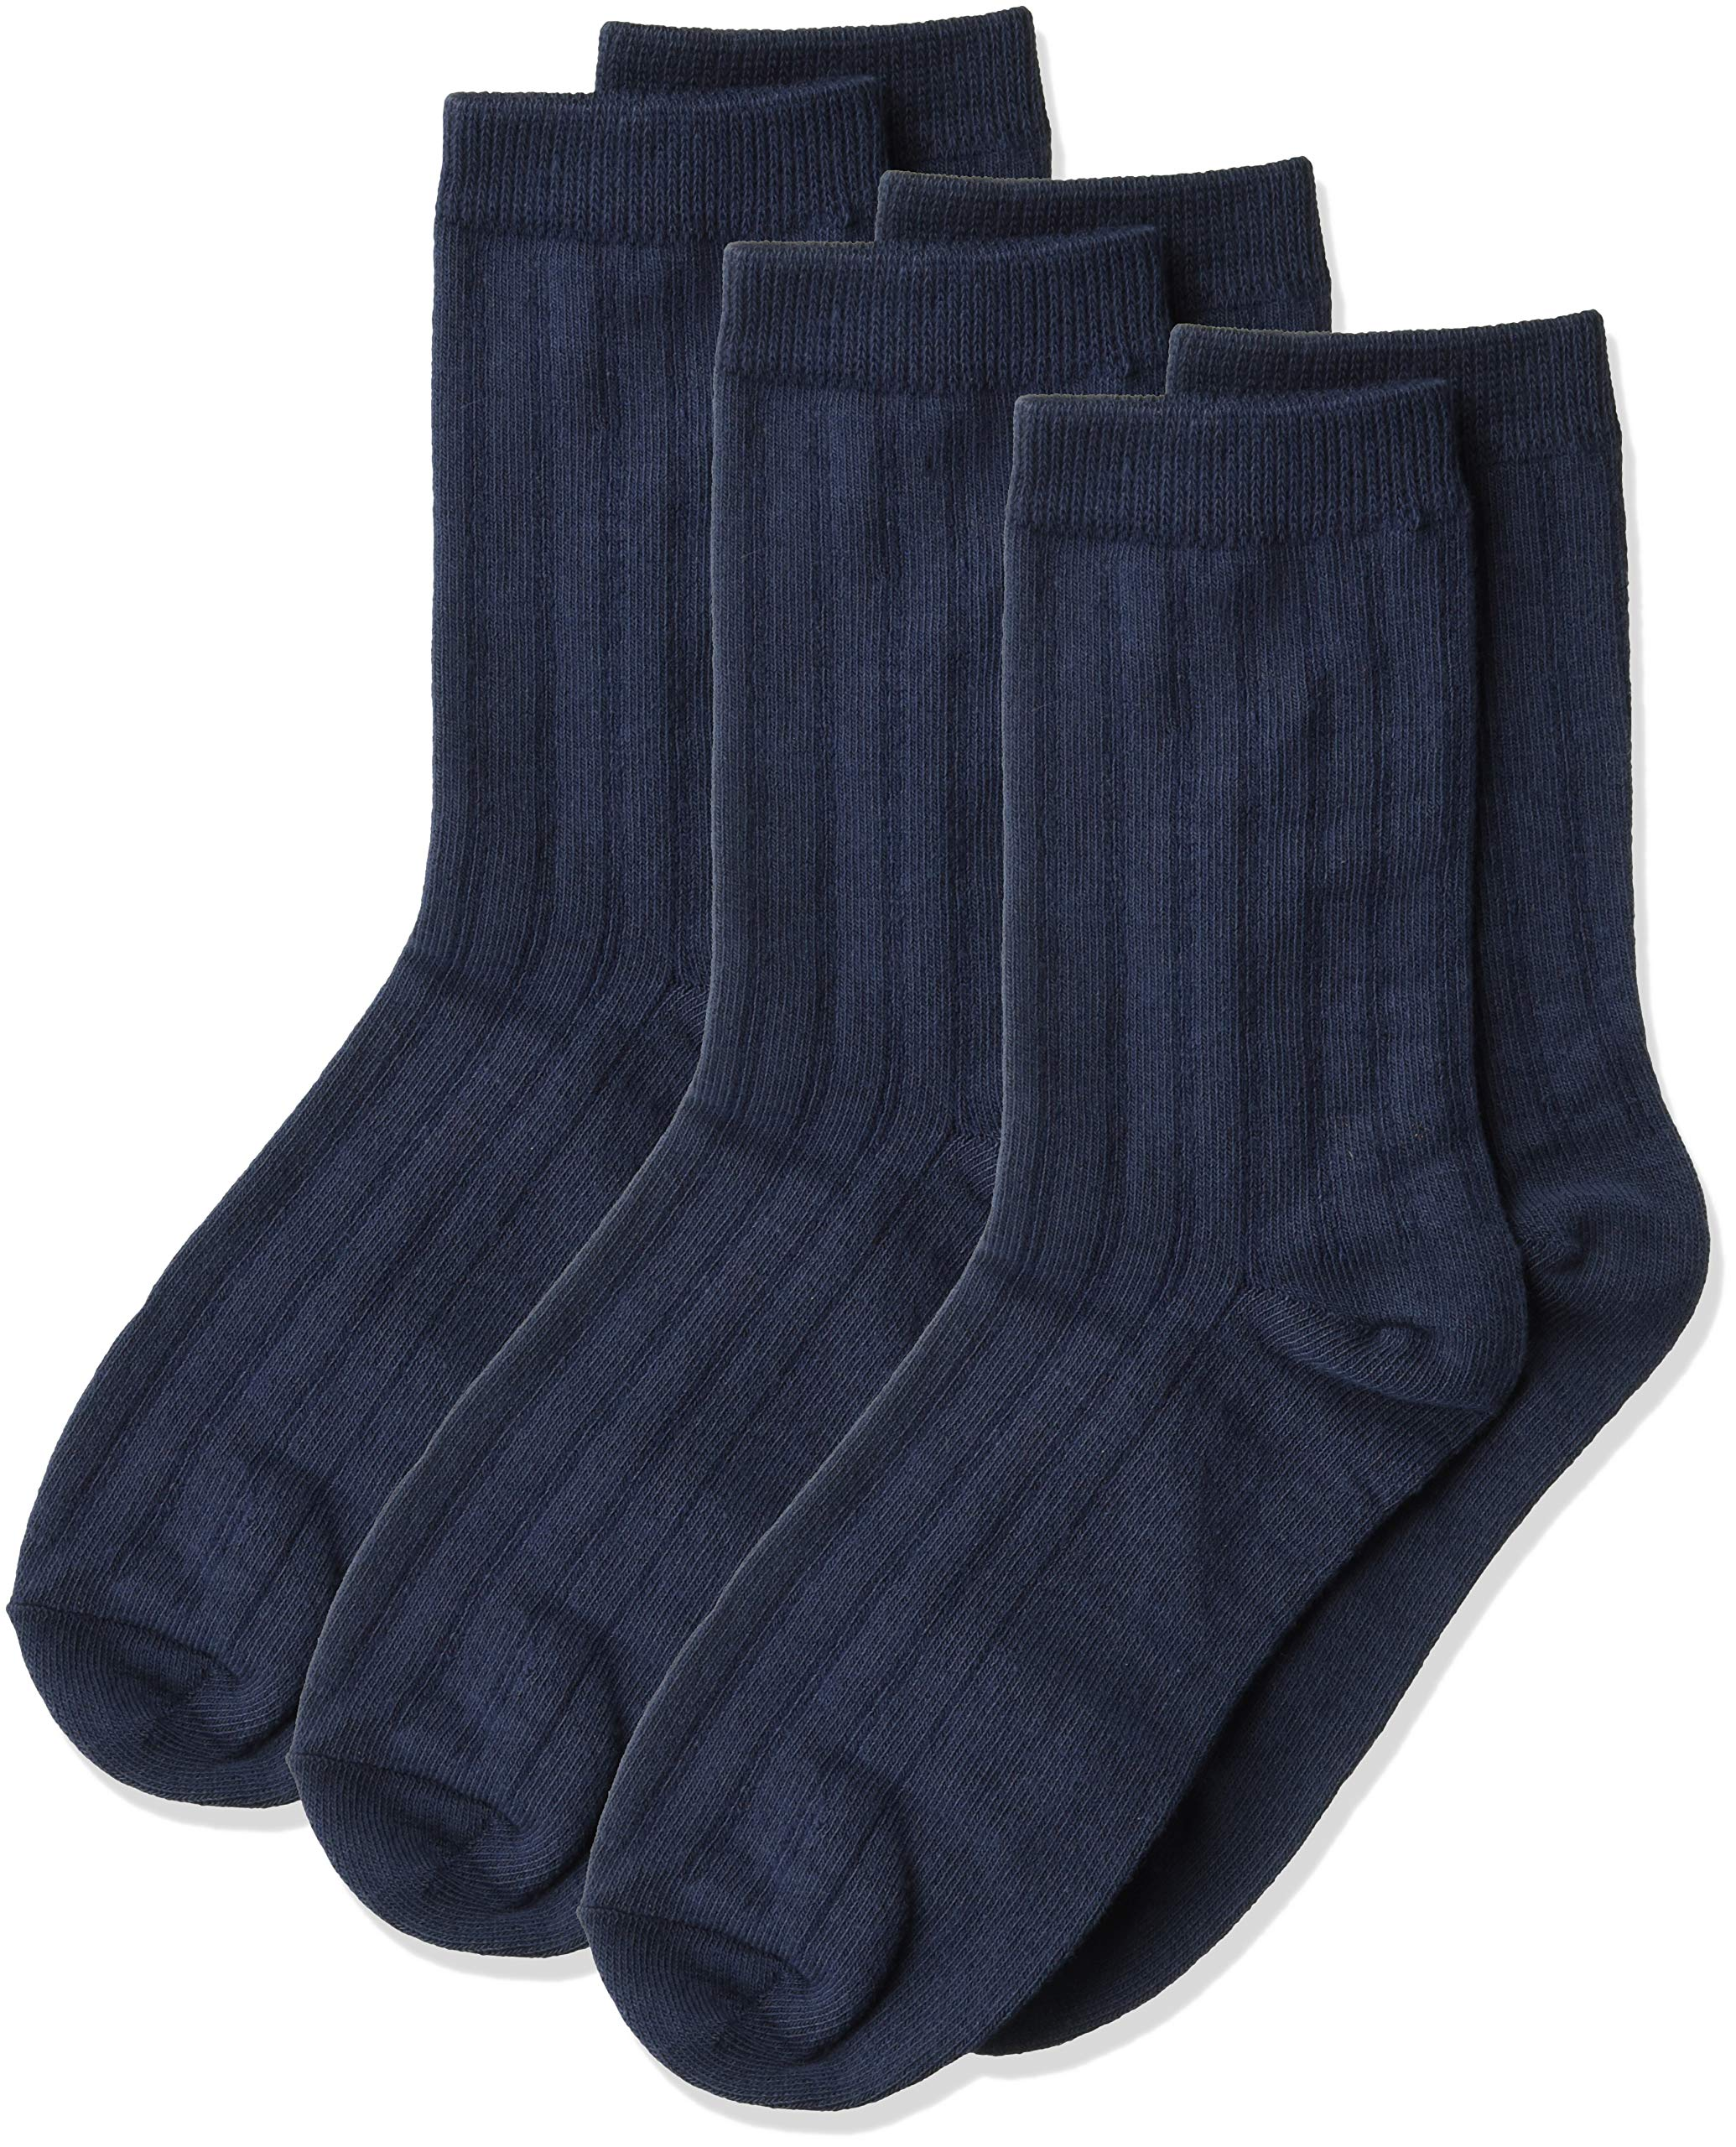 Jefferies Socks Big Boys' 9-1 Rib Crew  (Pack of 3), Navy, Small